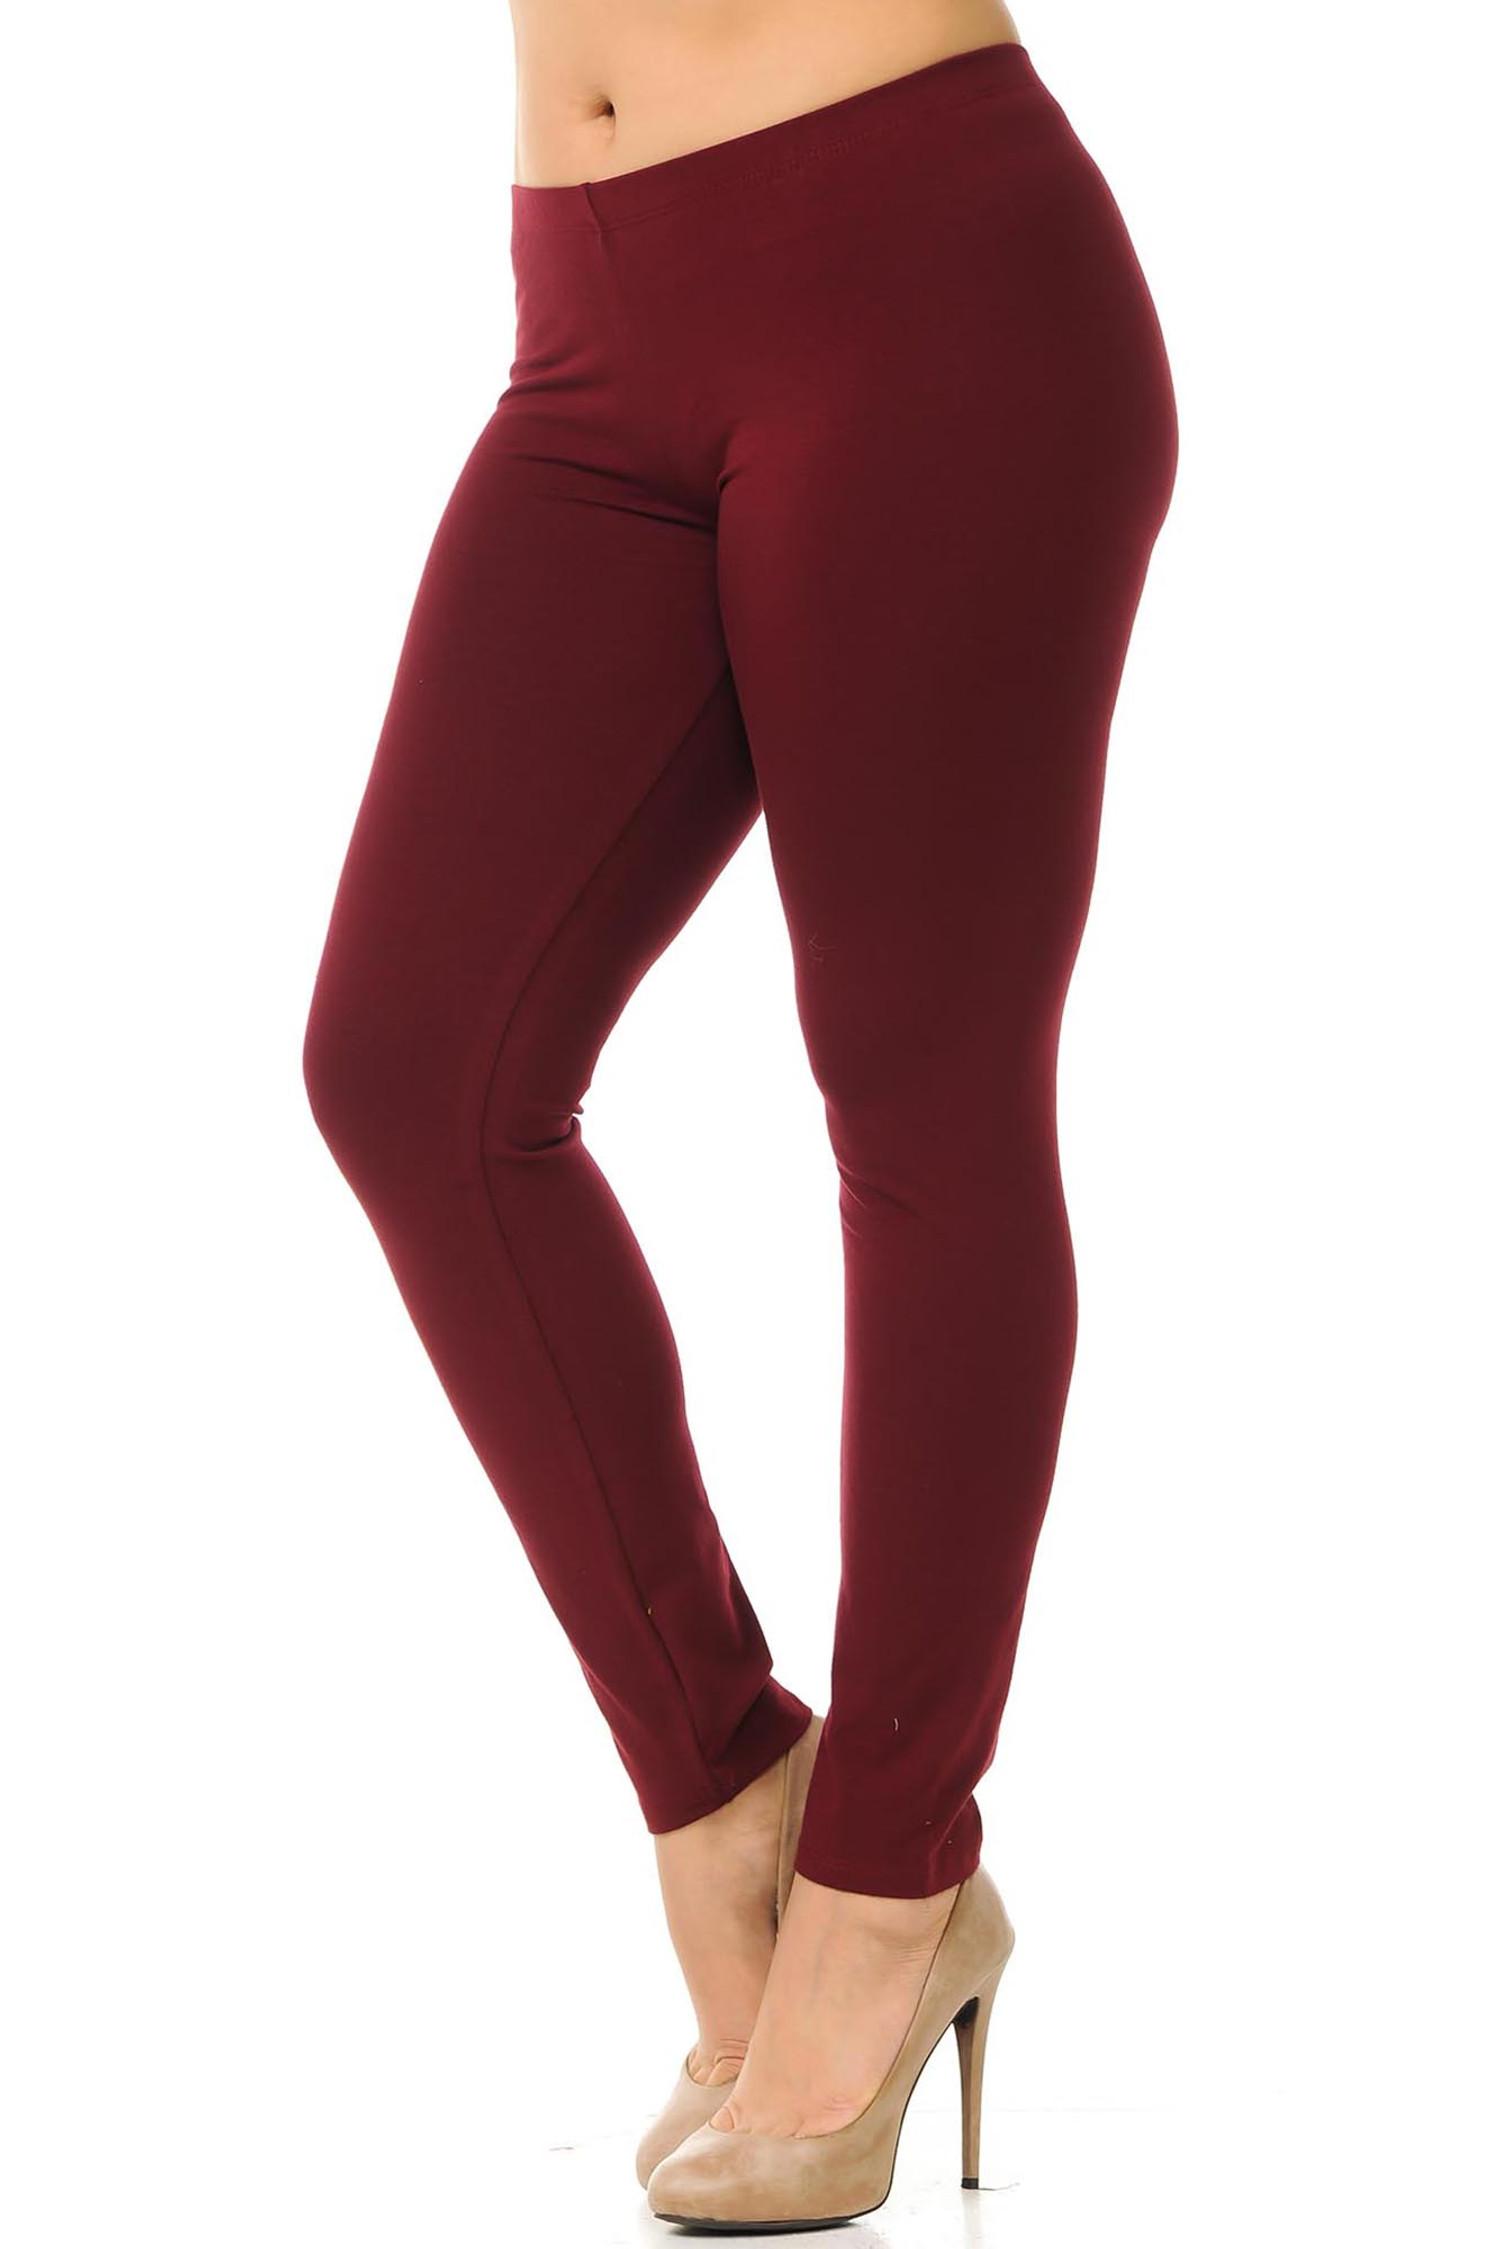 45 degree angled view of burgundy plus size qUSA Cotton Full Length Leggings